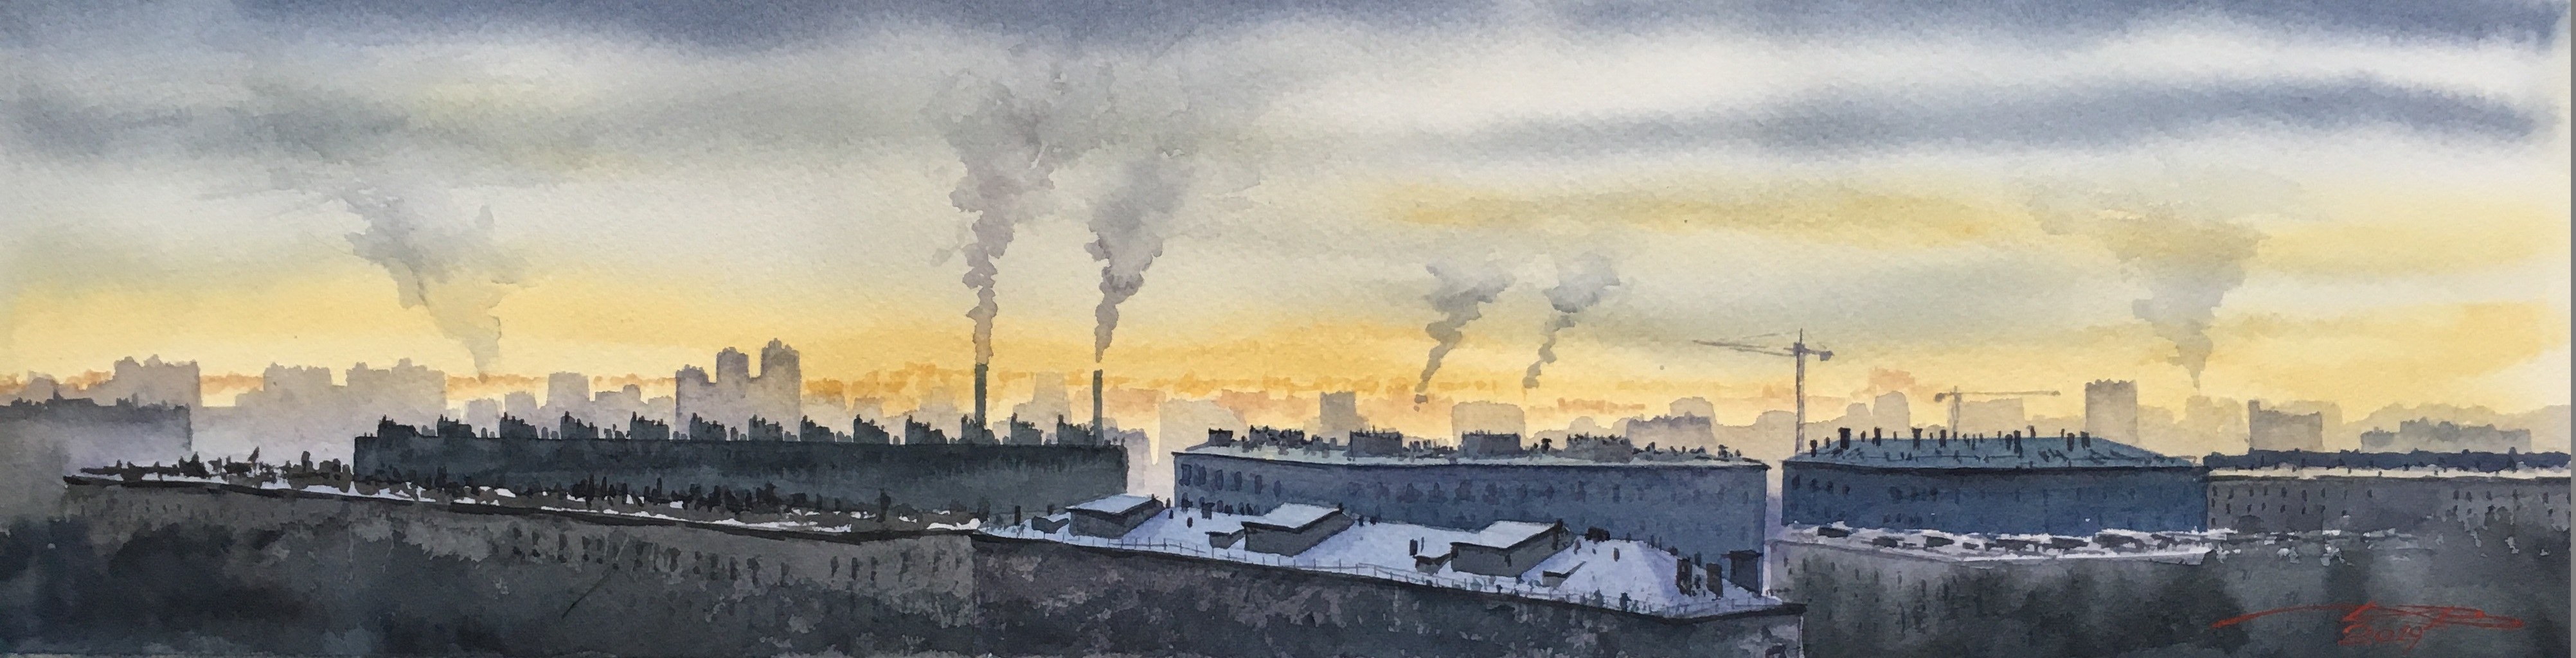 Москва мёрзнет